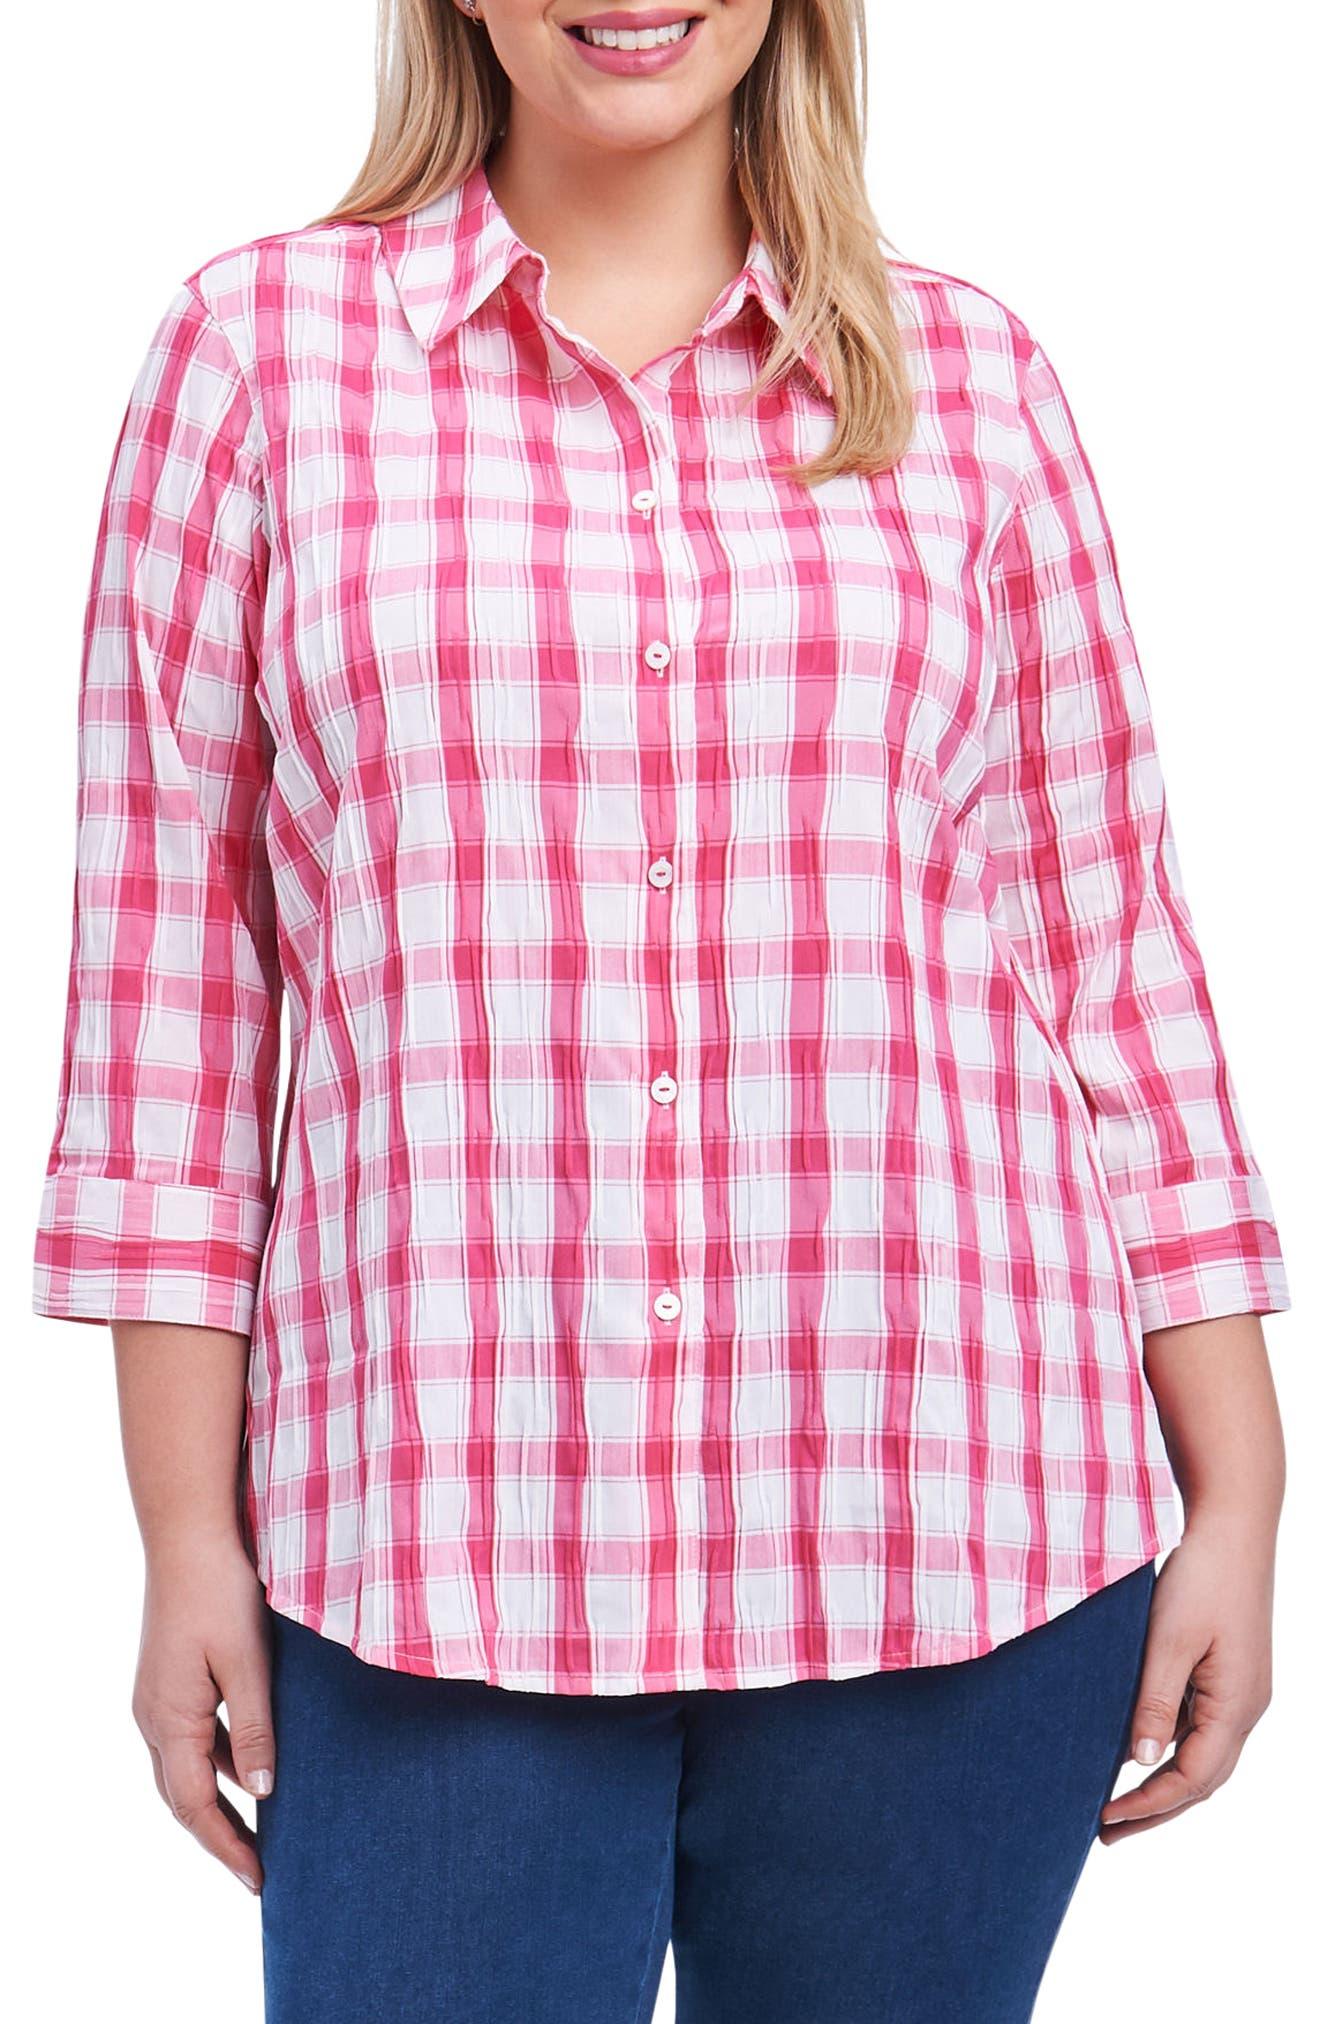 Sue Shaped Fit Crinkle Plaid Shirt,                             Main thumbnail 1, color,                             Hot Pink